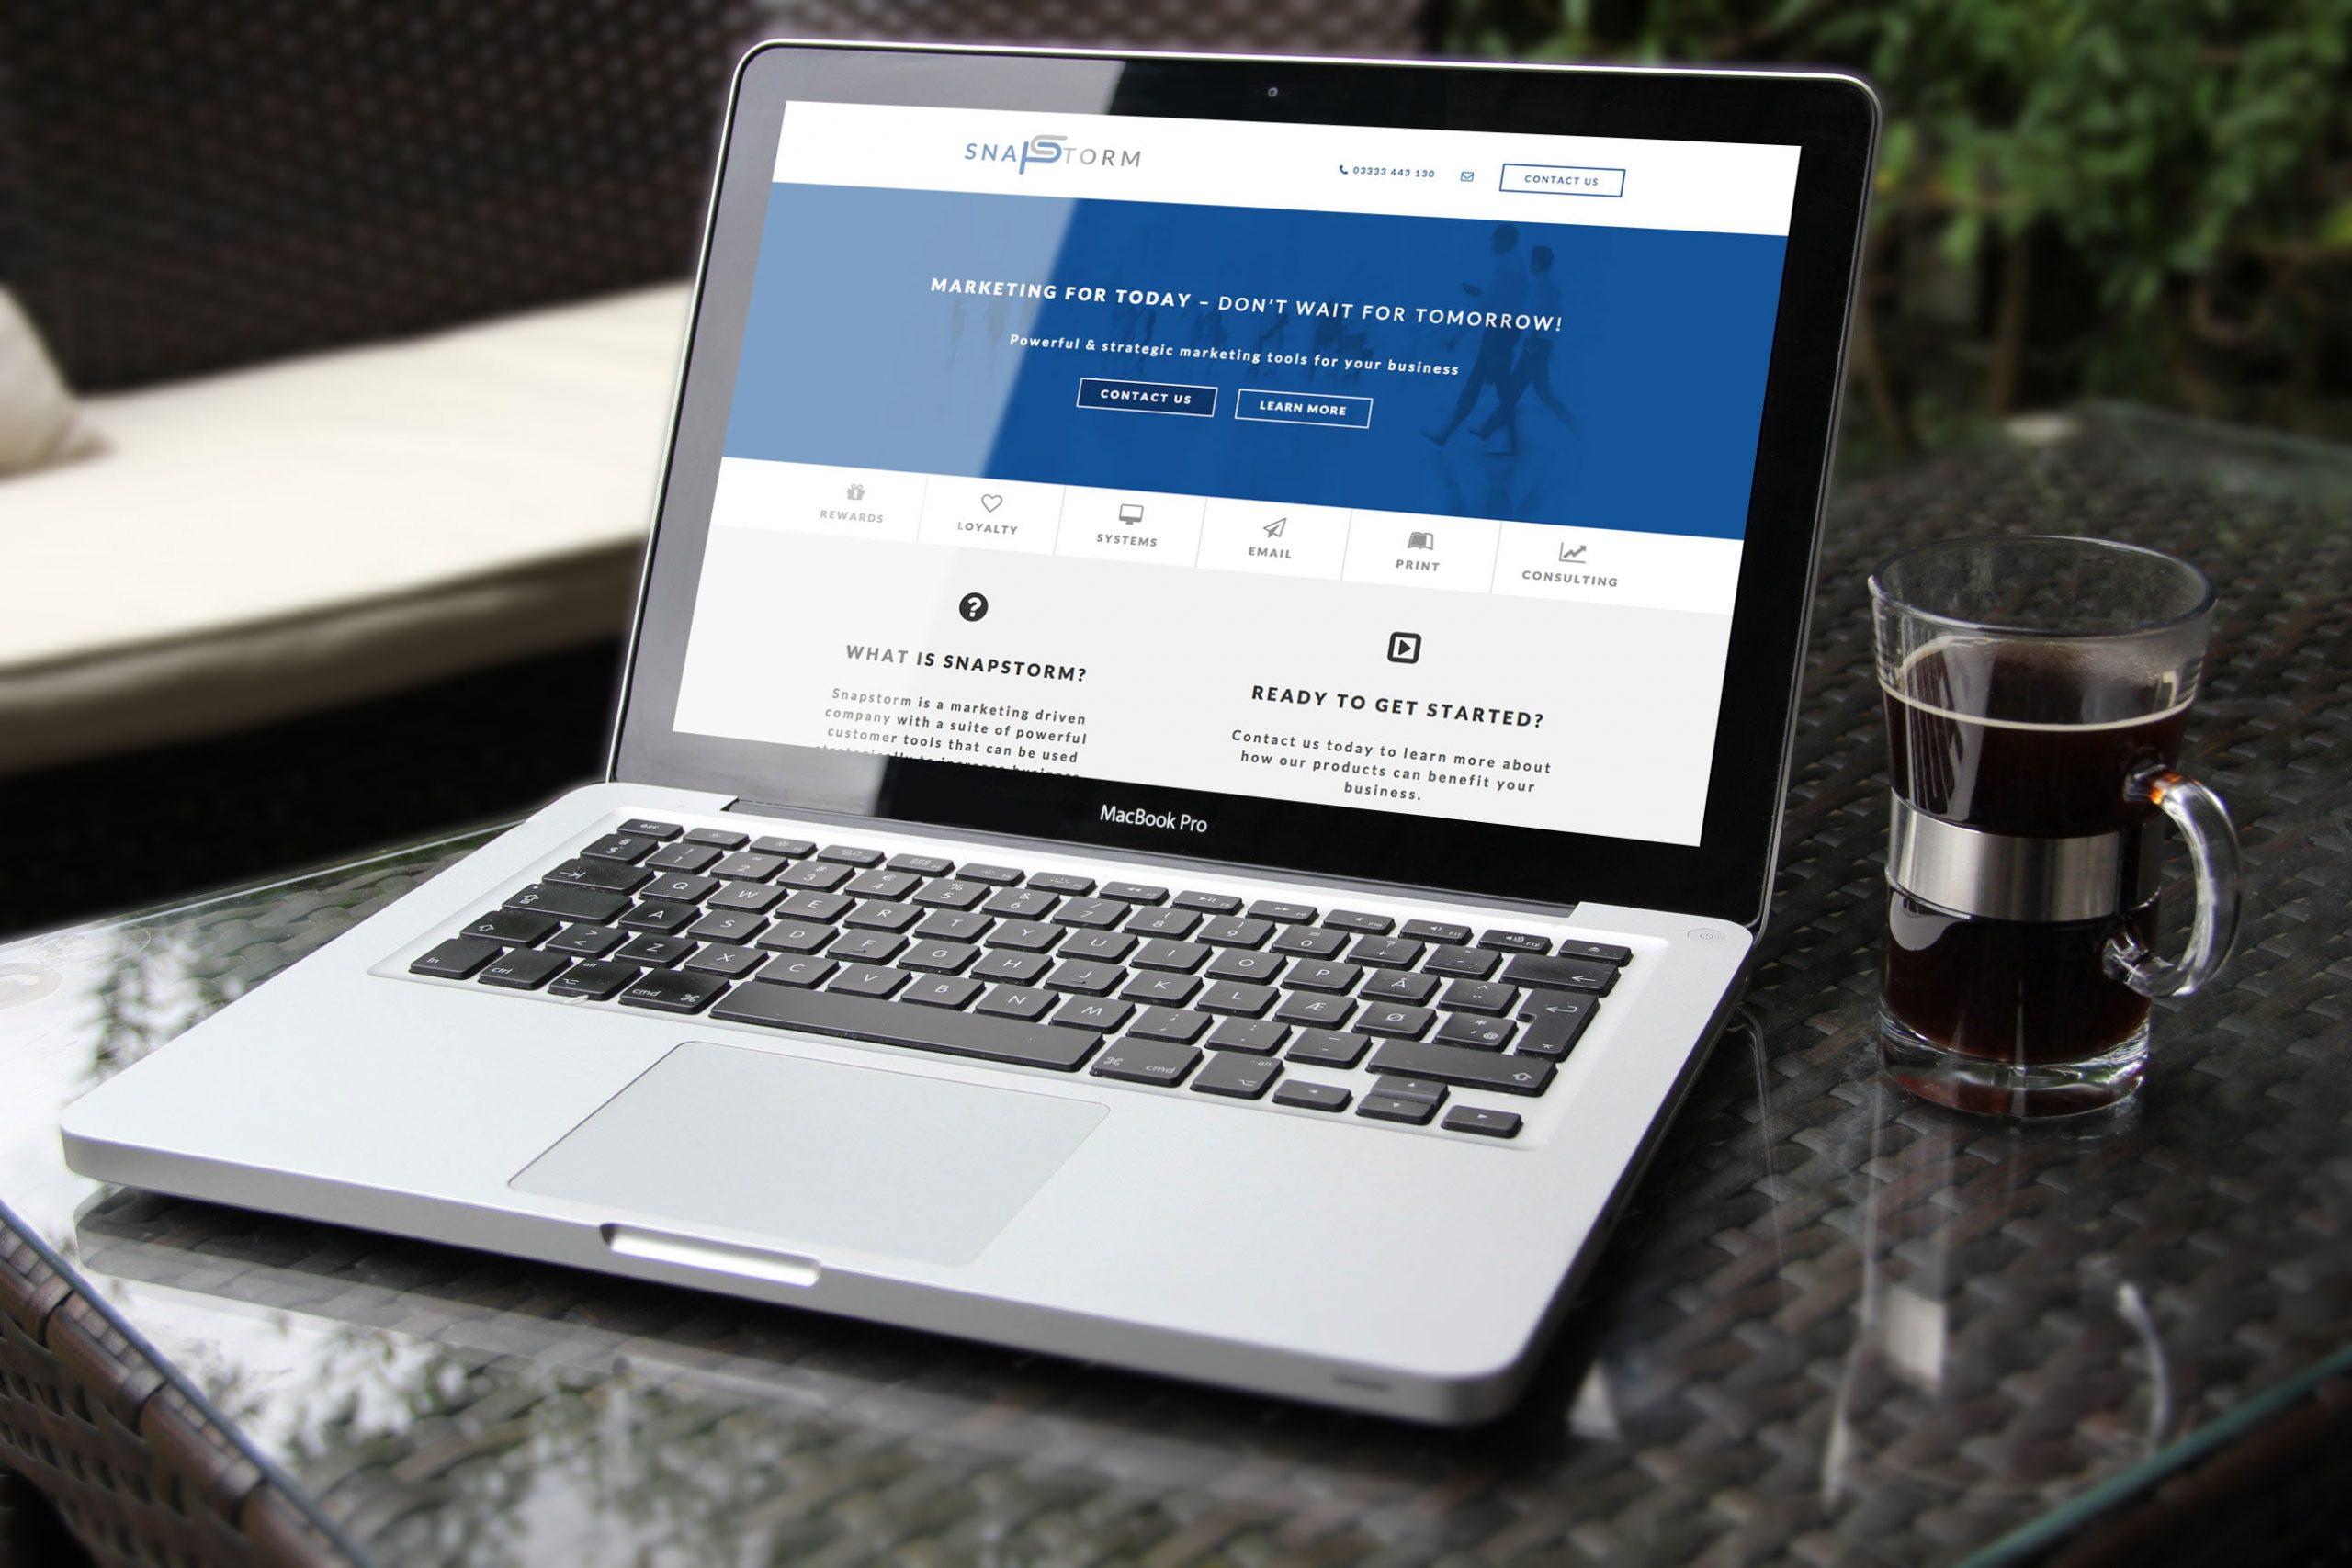 Snapstorm website displayed on laptop